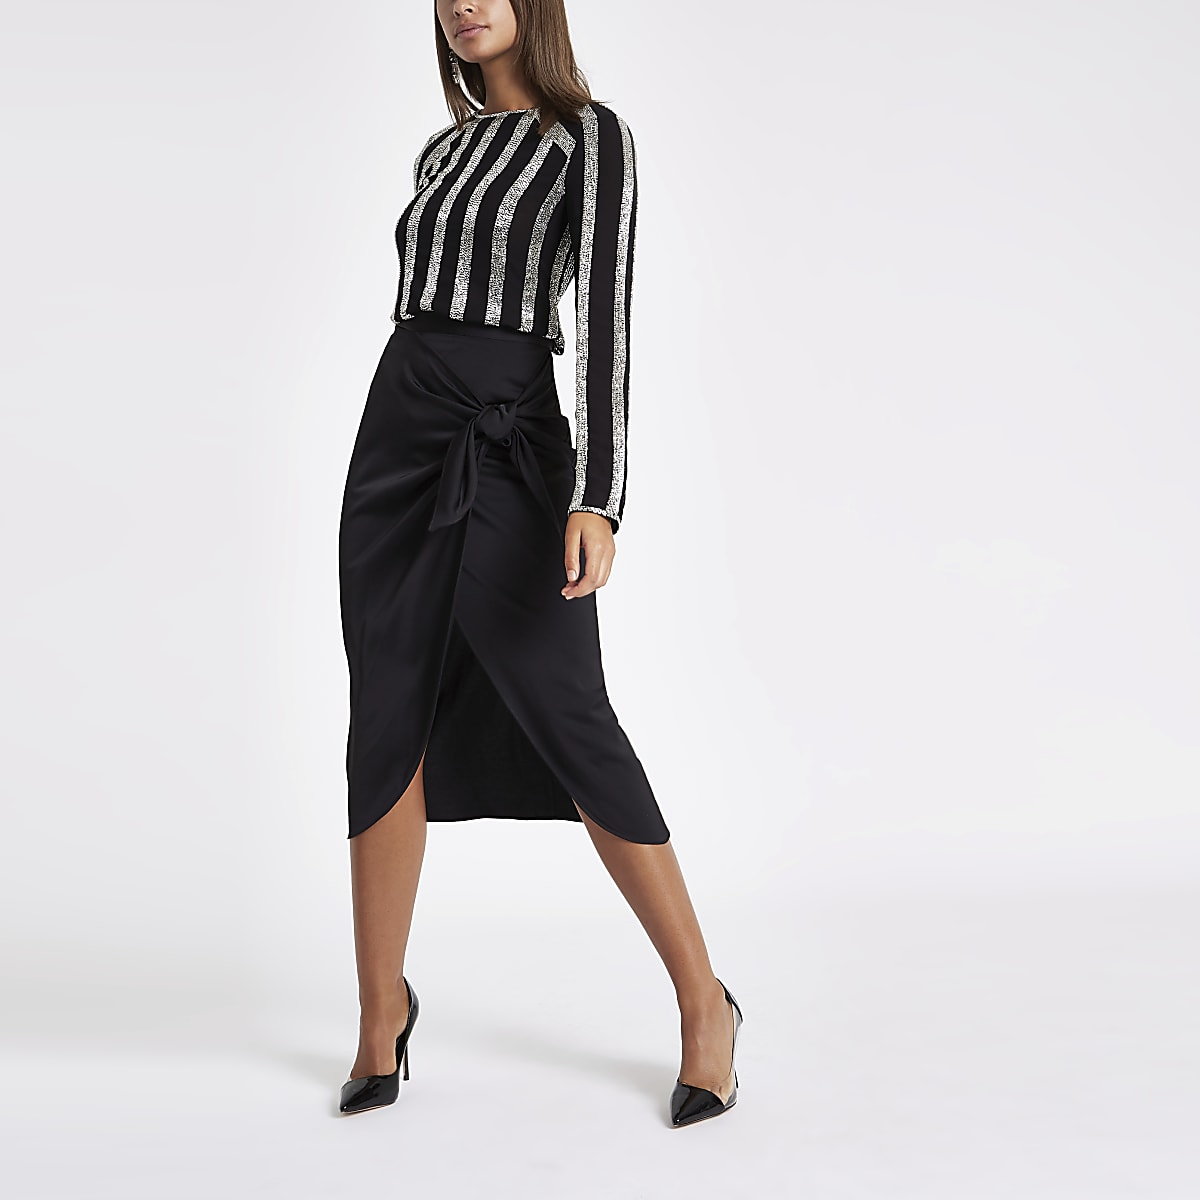 Black satin tie front pencil skirt